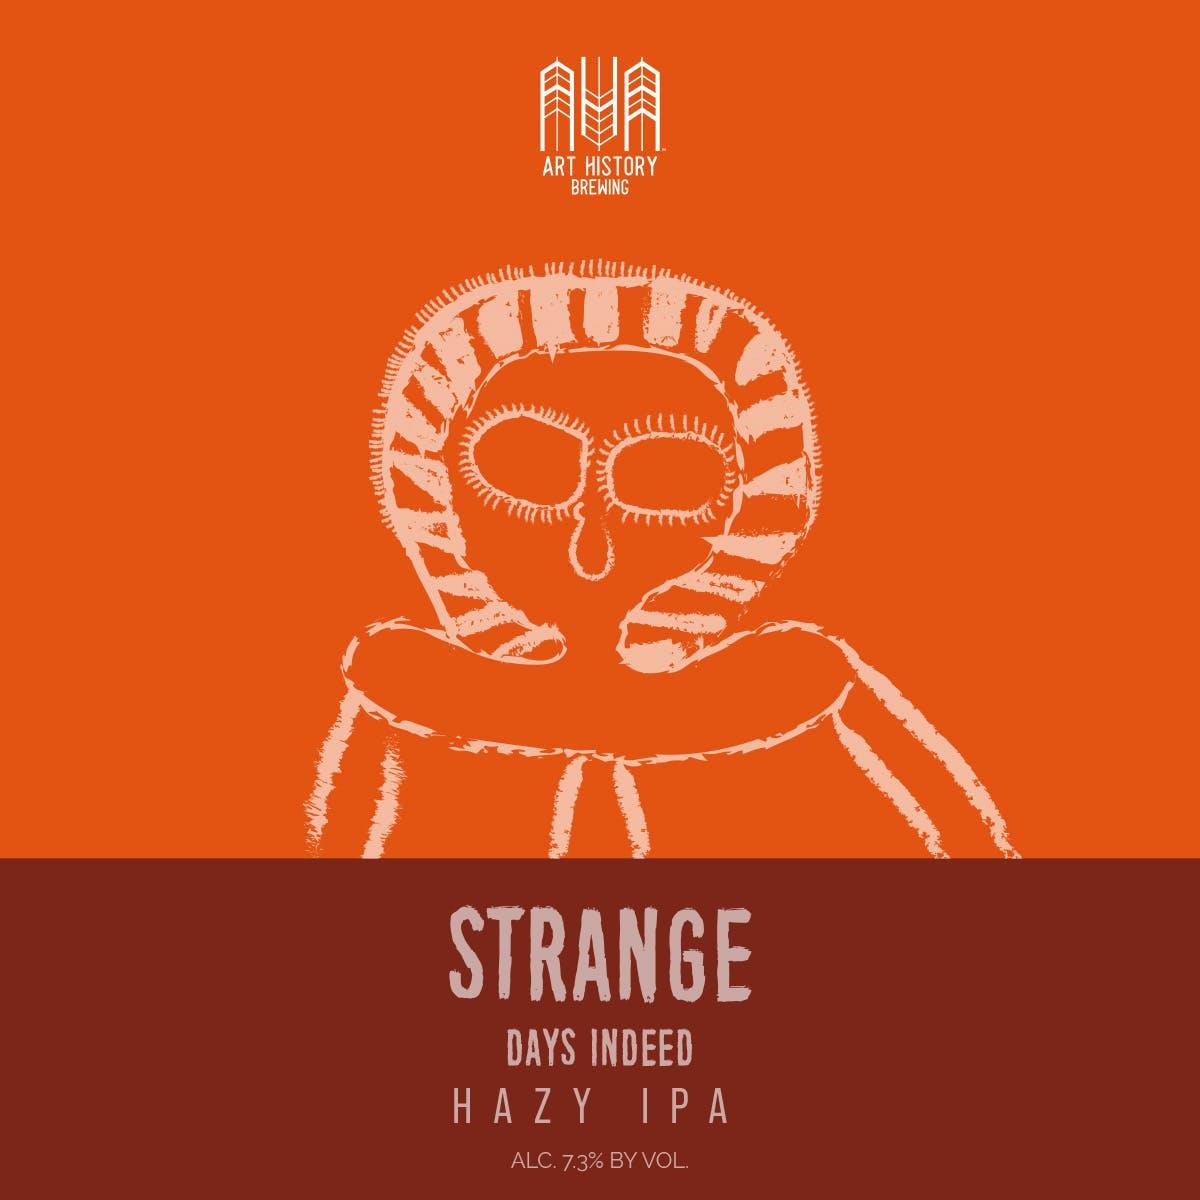 strangedaysindeed